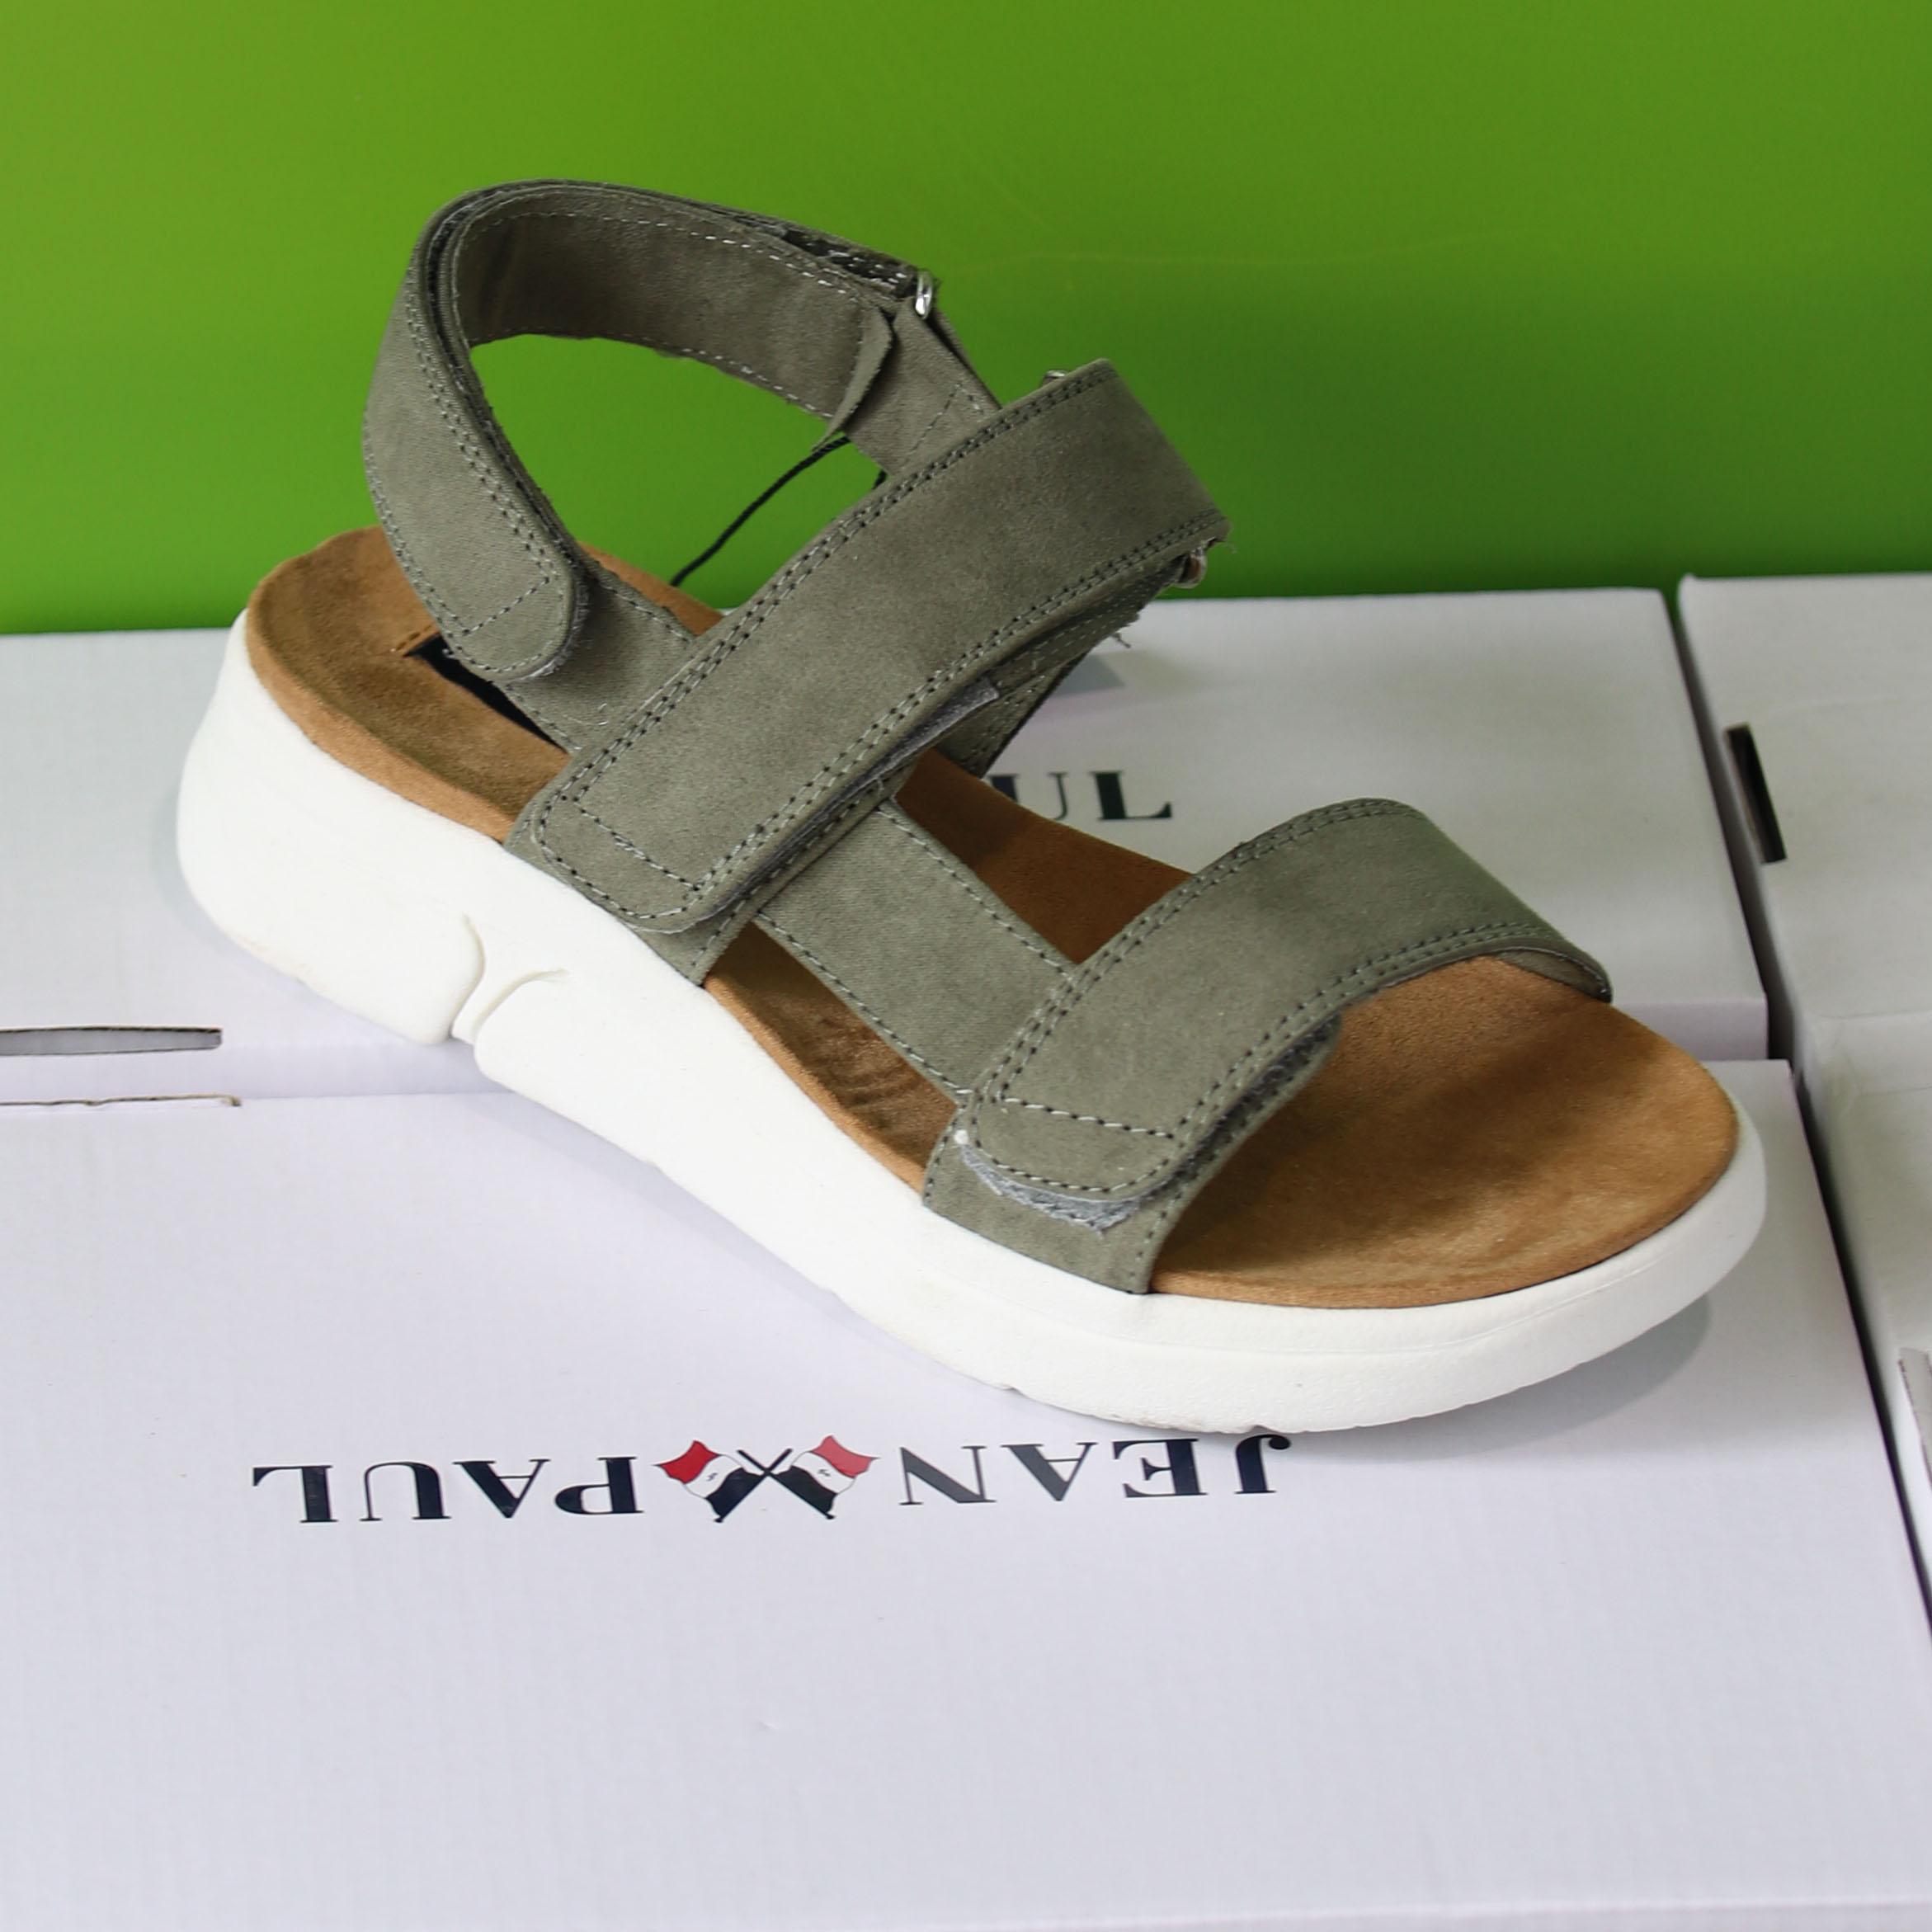 jean paul – vecchio sommersko dame sandaler1